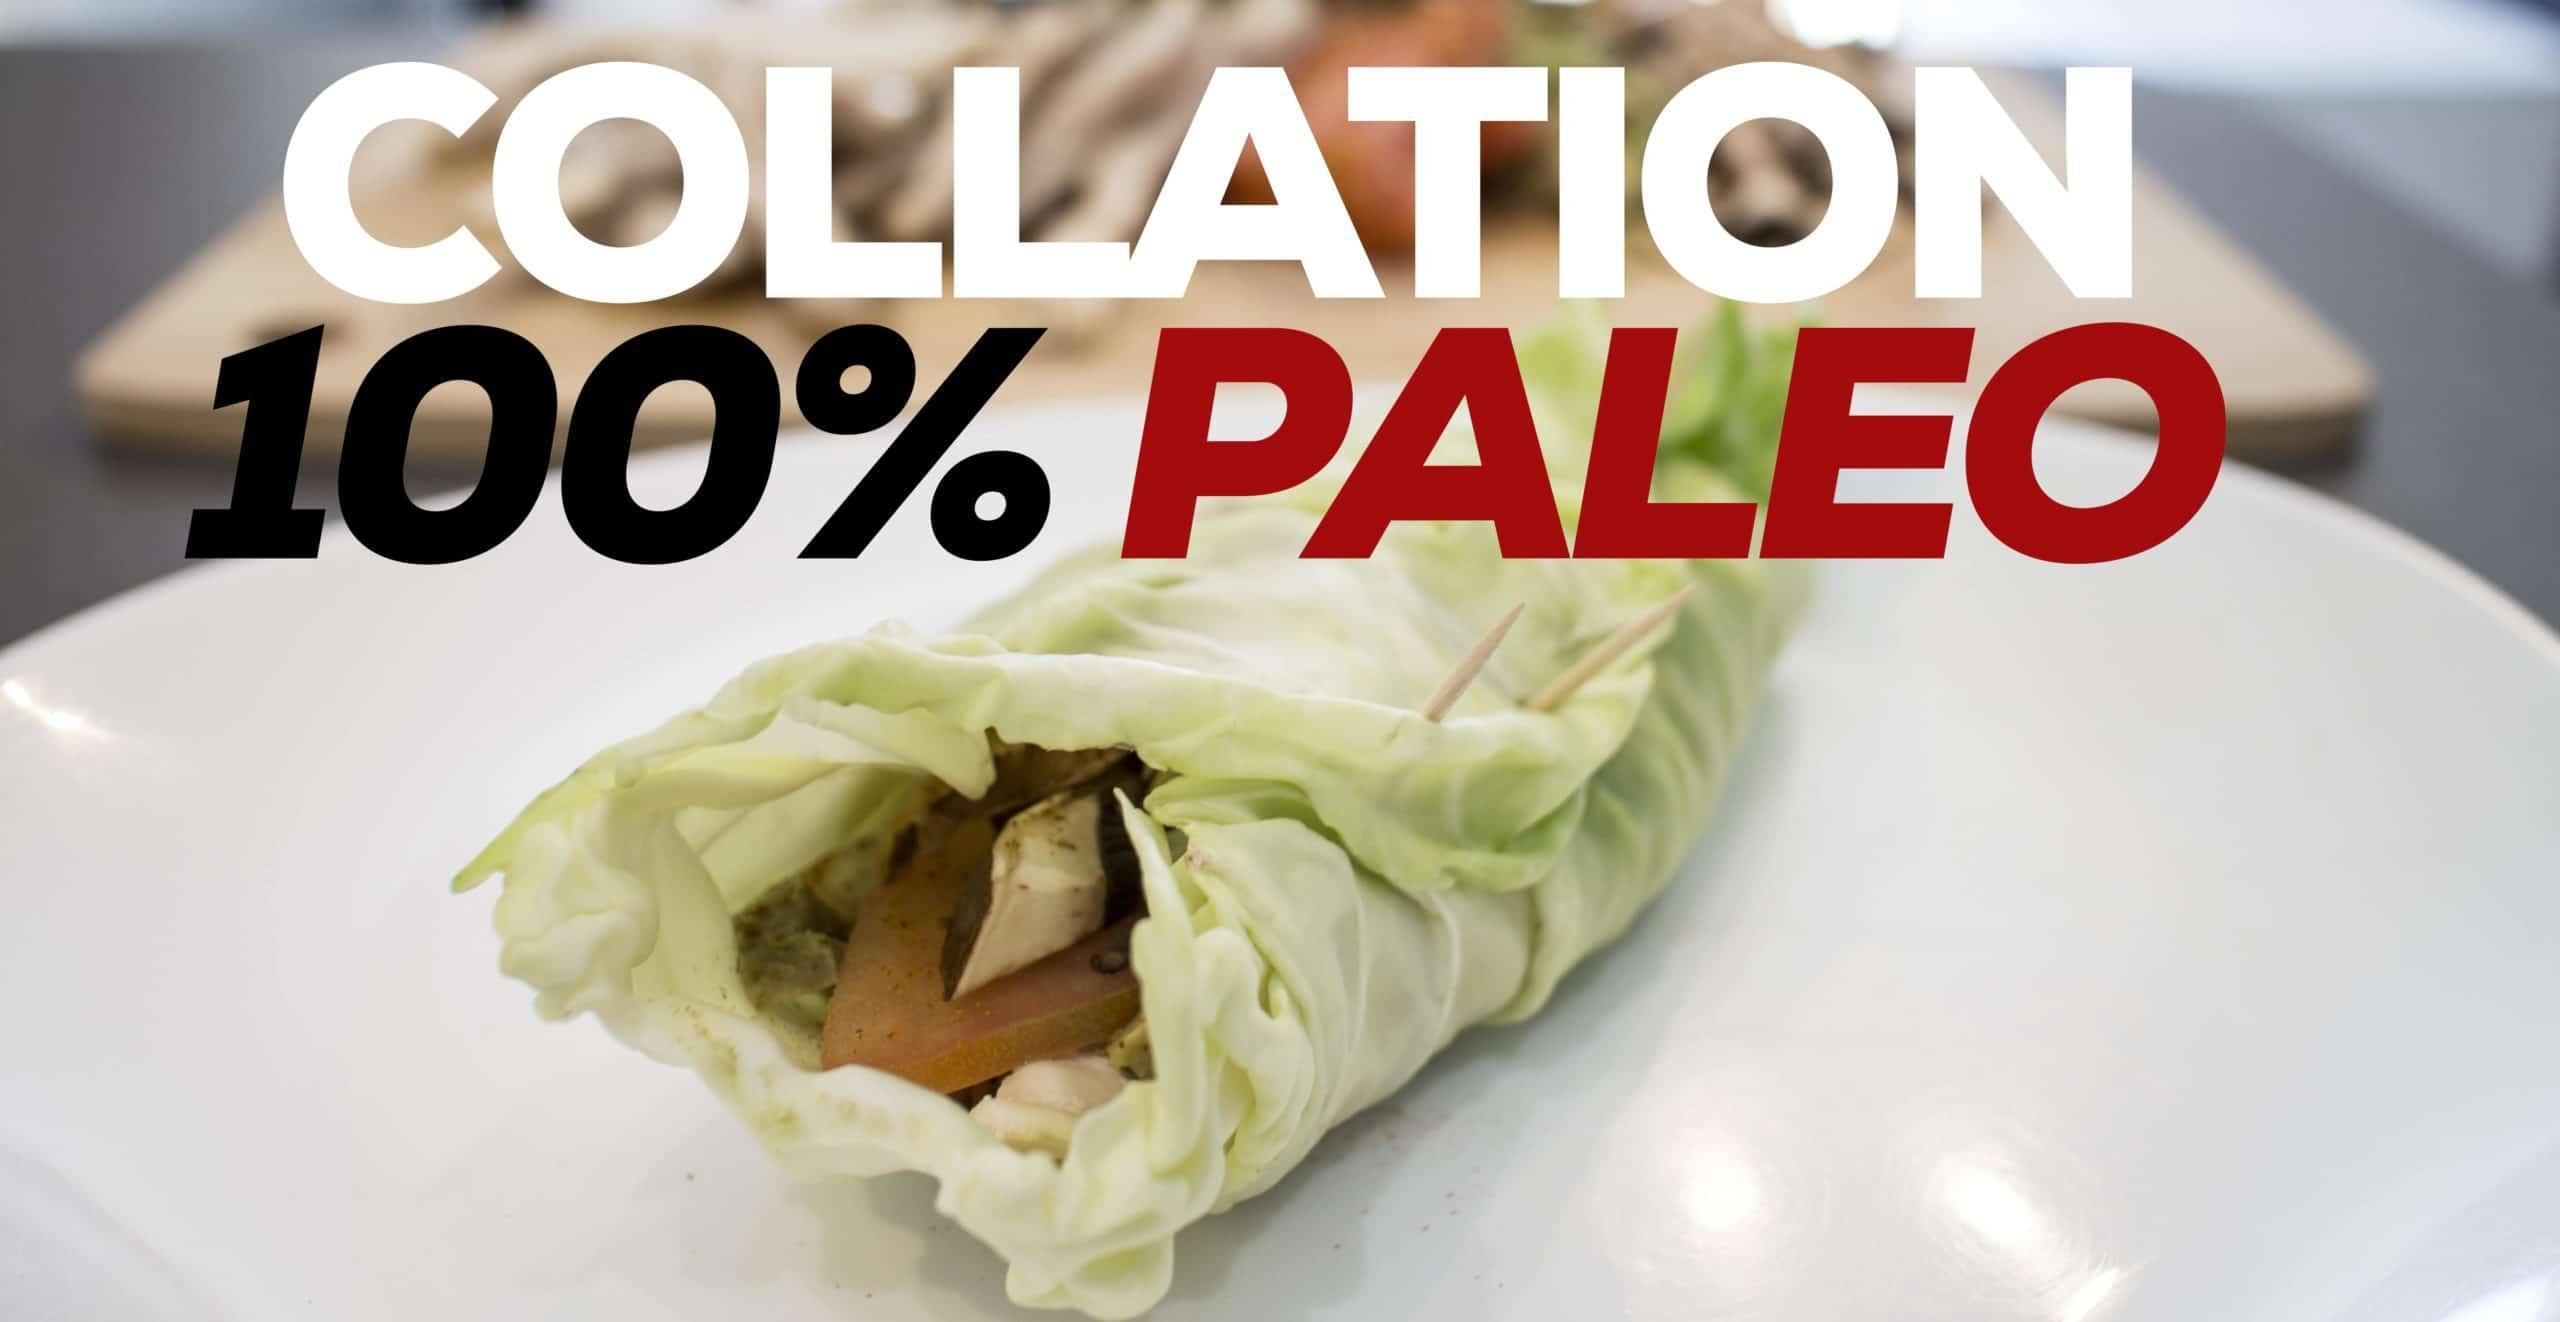 collation paleo